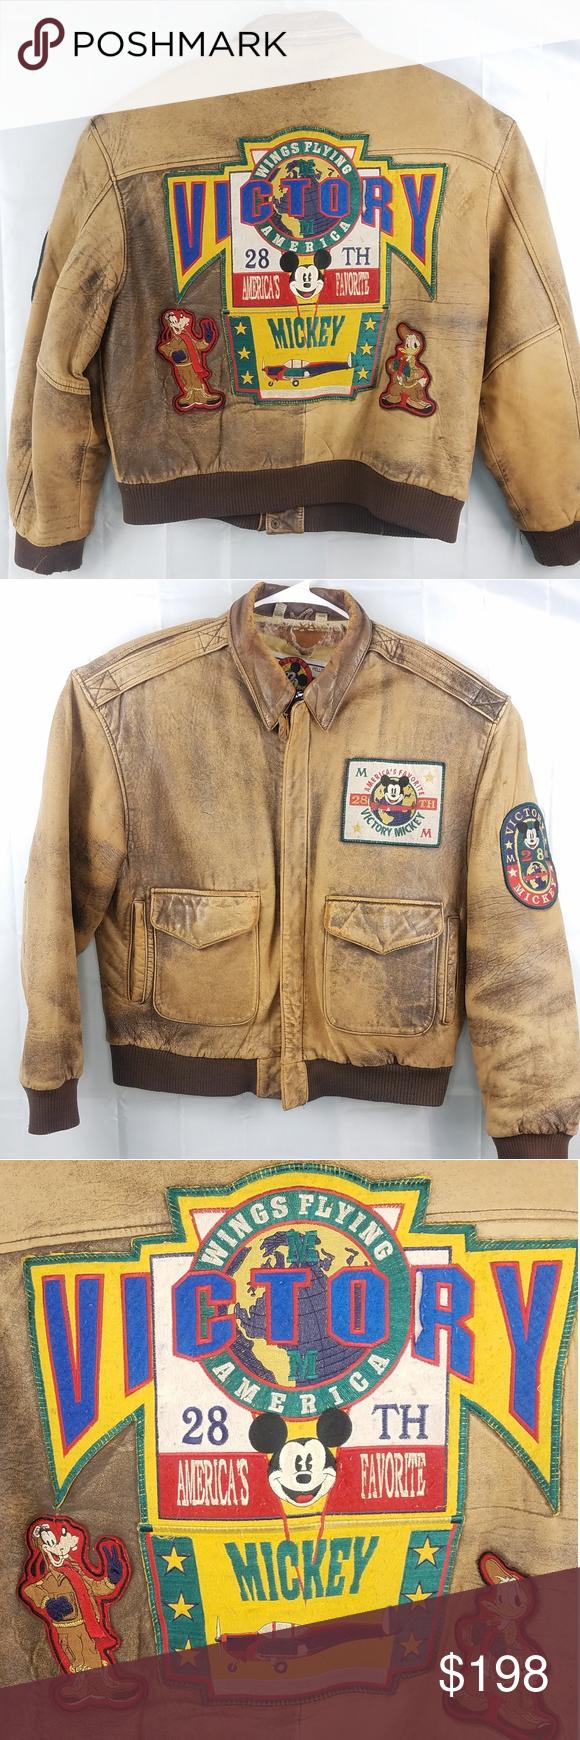 Victory Mickey Mouse Aviator Bomber Jacket Coat Jackets Bomber Jacket Disney Jacket [ 1740 x 580 Pixel ]